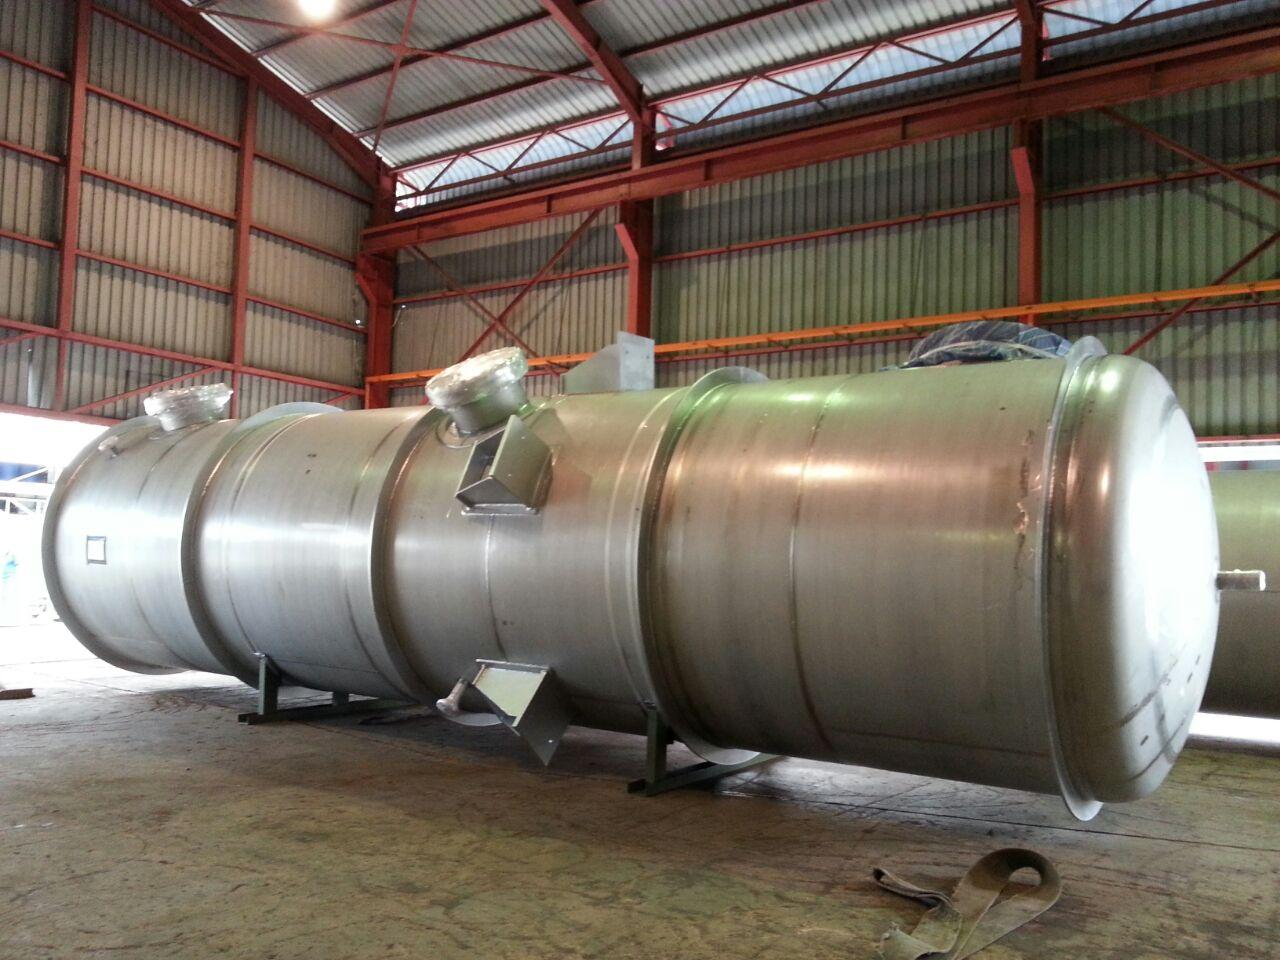 Refinery Equipment 4